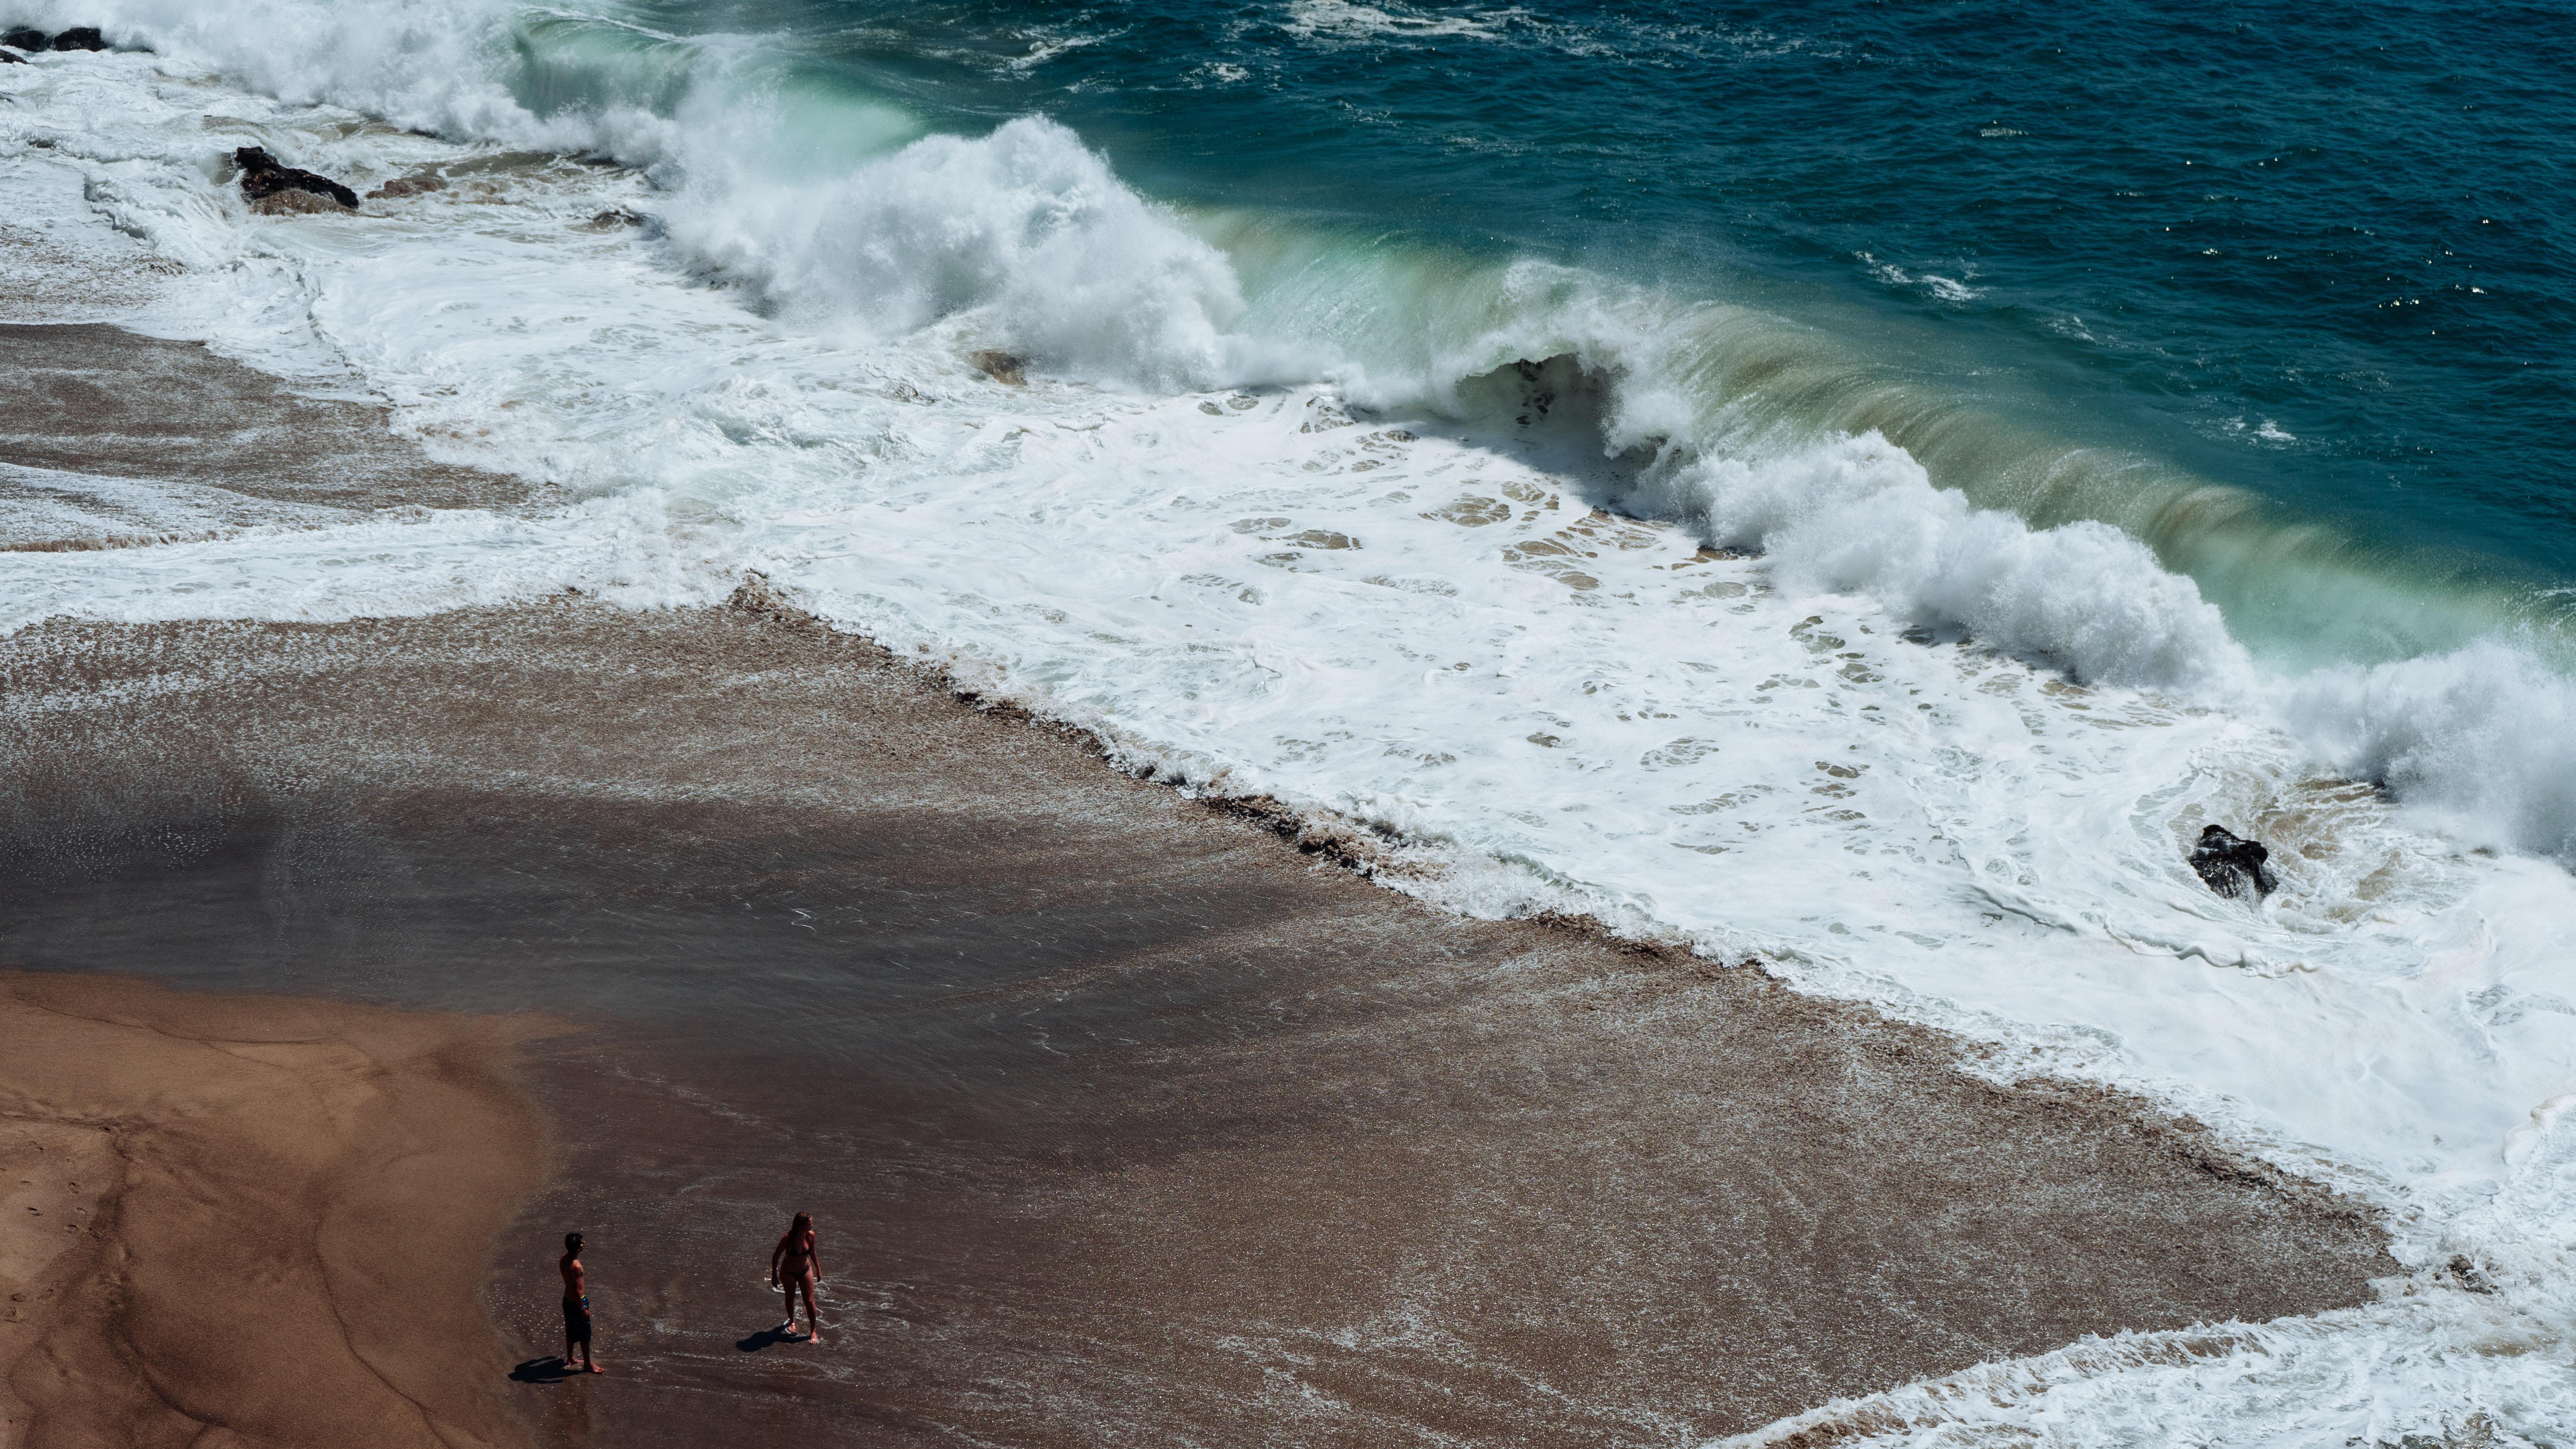 two person on seashore facing ocean waves